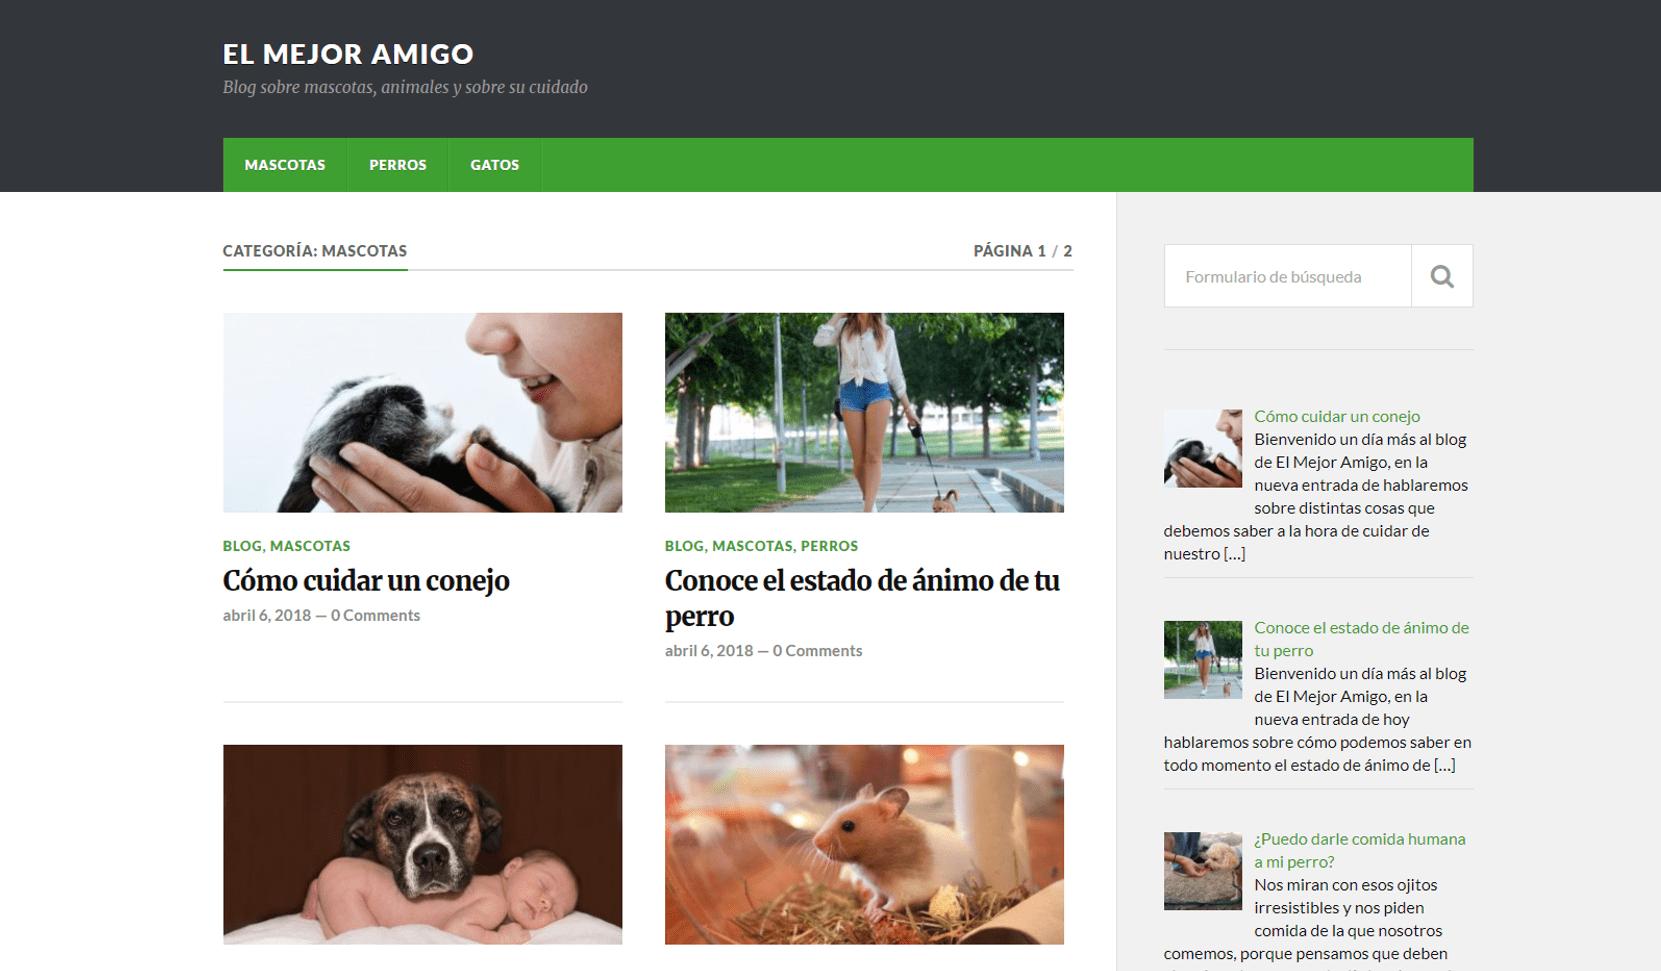 Elmejoramigo.es: nuevo blog de consejos para mascotas